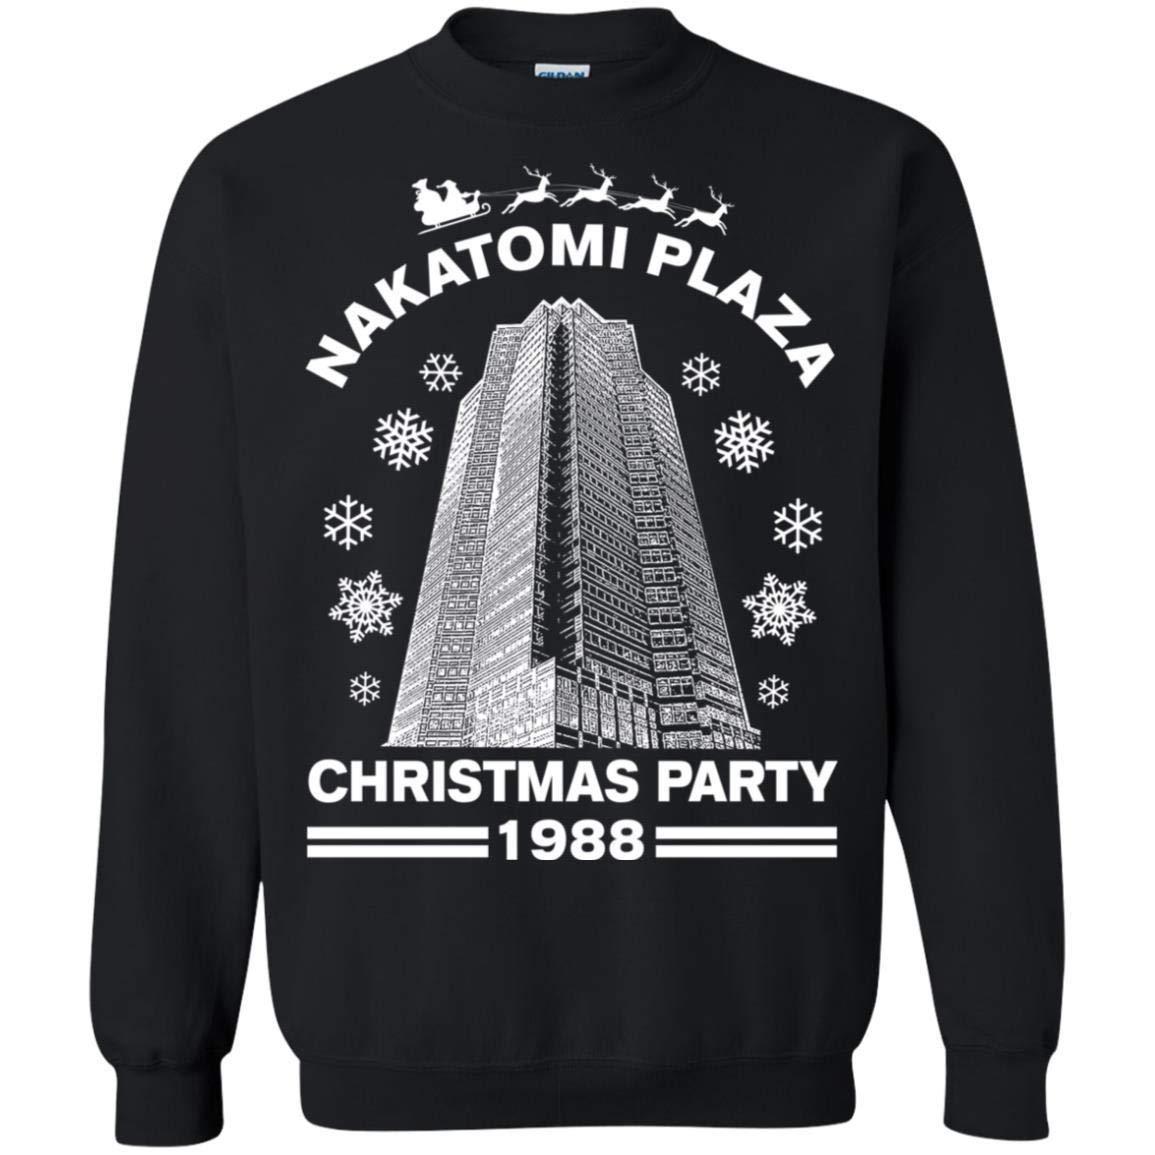 Teepowers Nakatomi Plaza Christmas Party 1988 Funny Pop Culture Unisex Shirts